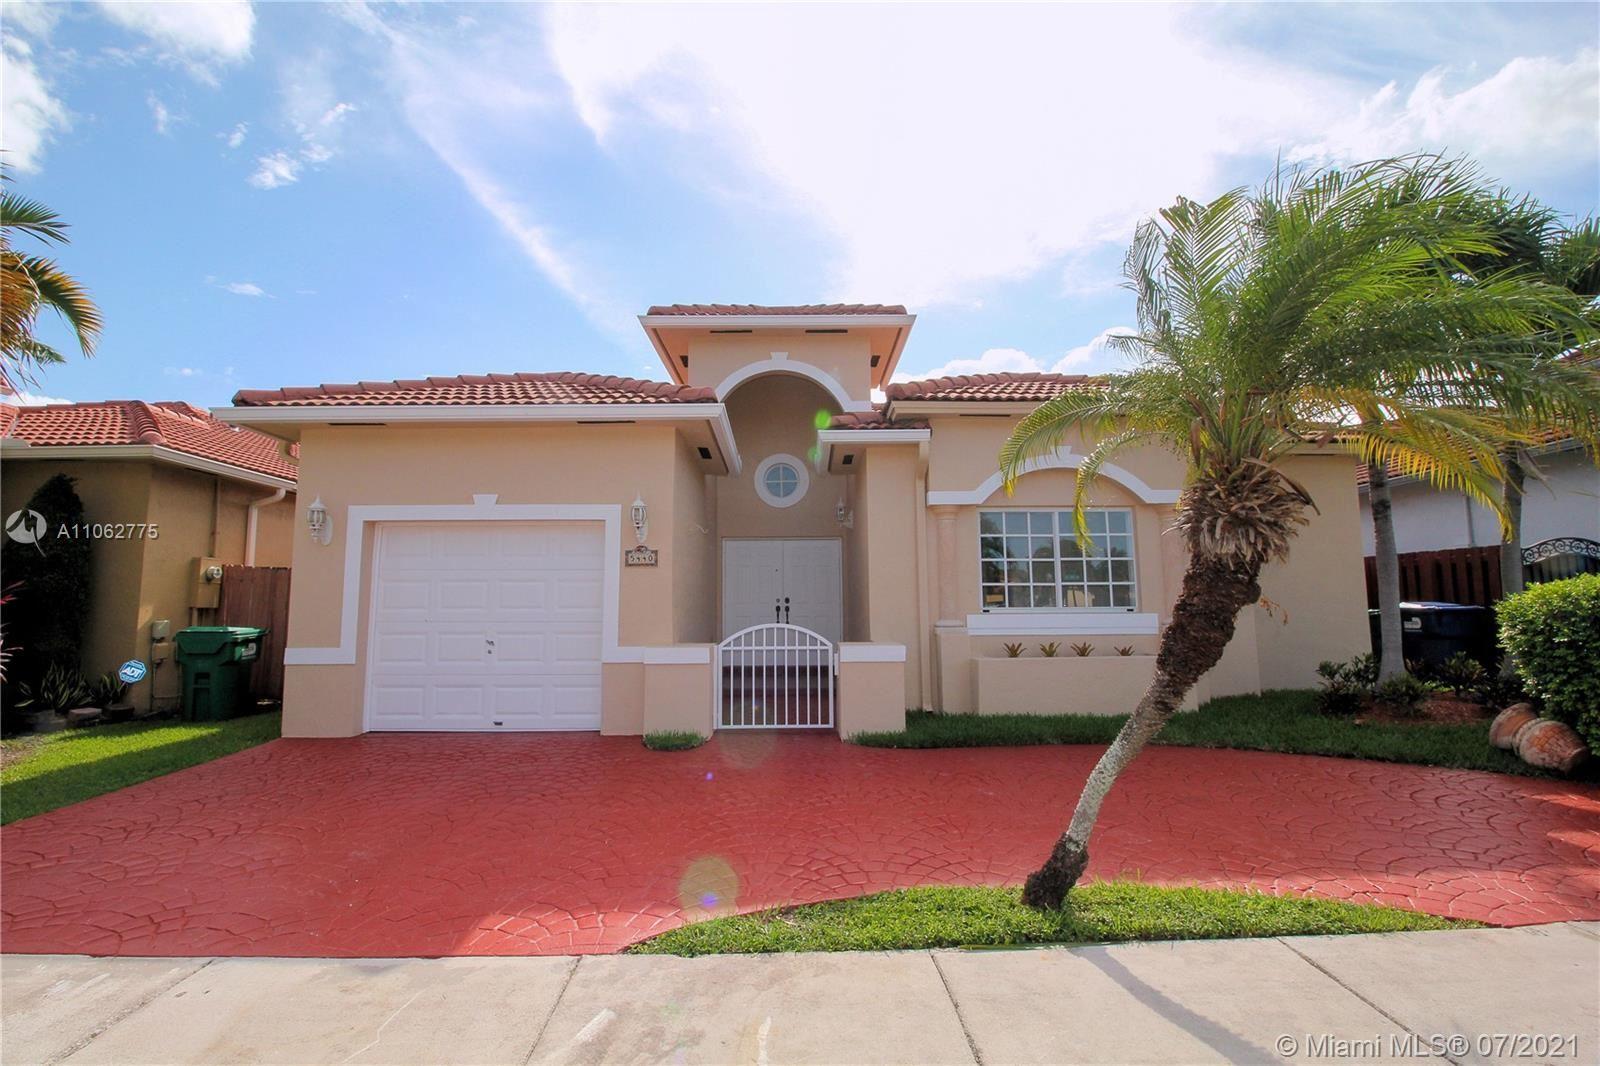 5440 SW 161st Pl, Miami, FL 33185 - #: A11062775